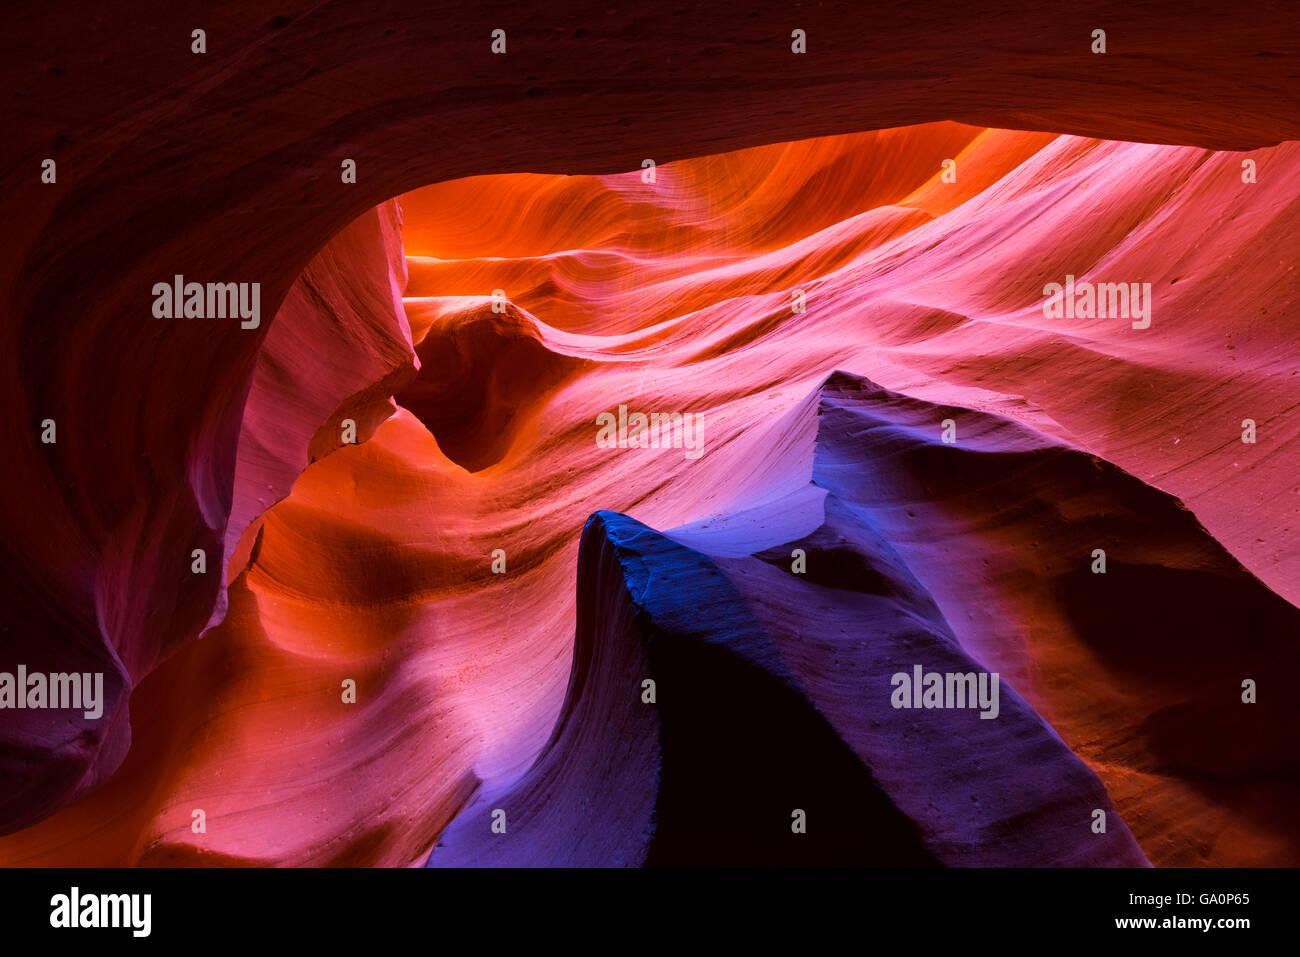 Eroded sandstone patterns on walls of Lower Canyon, Antelope Canyon, Page, Arizona, USA, February 2015. - Stock Image